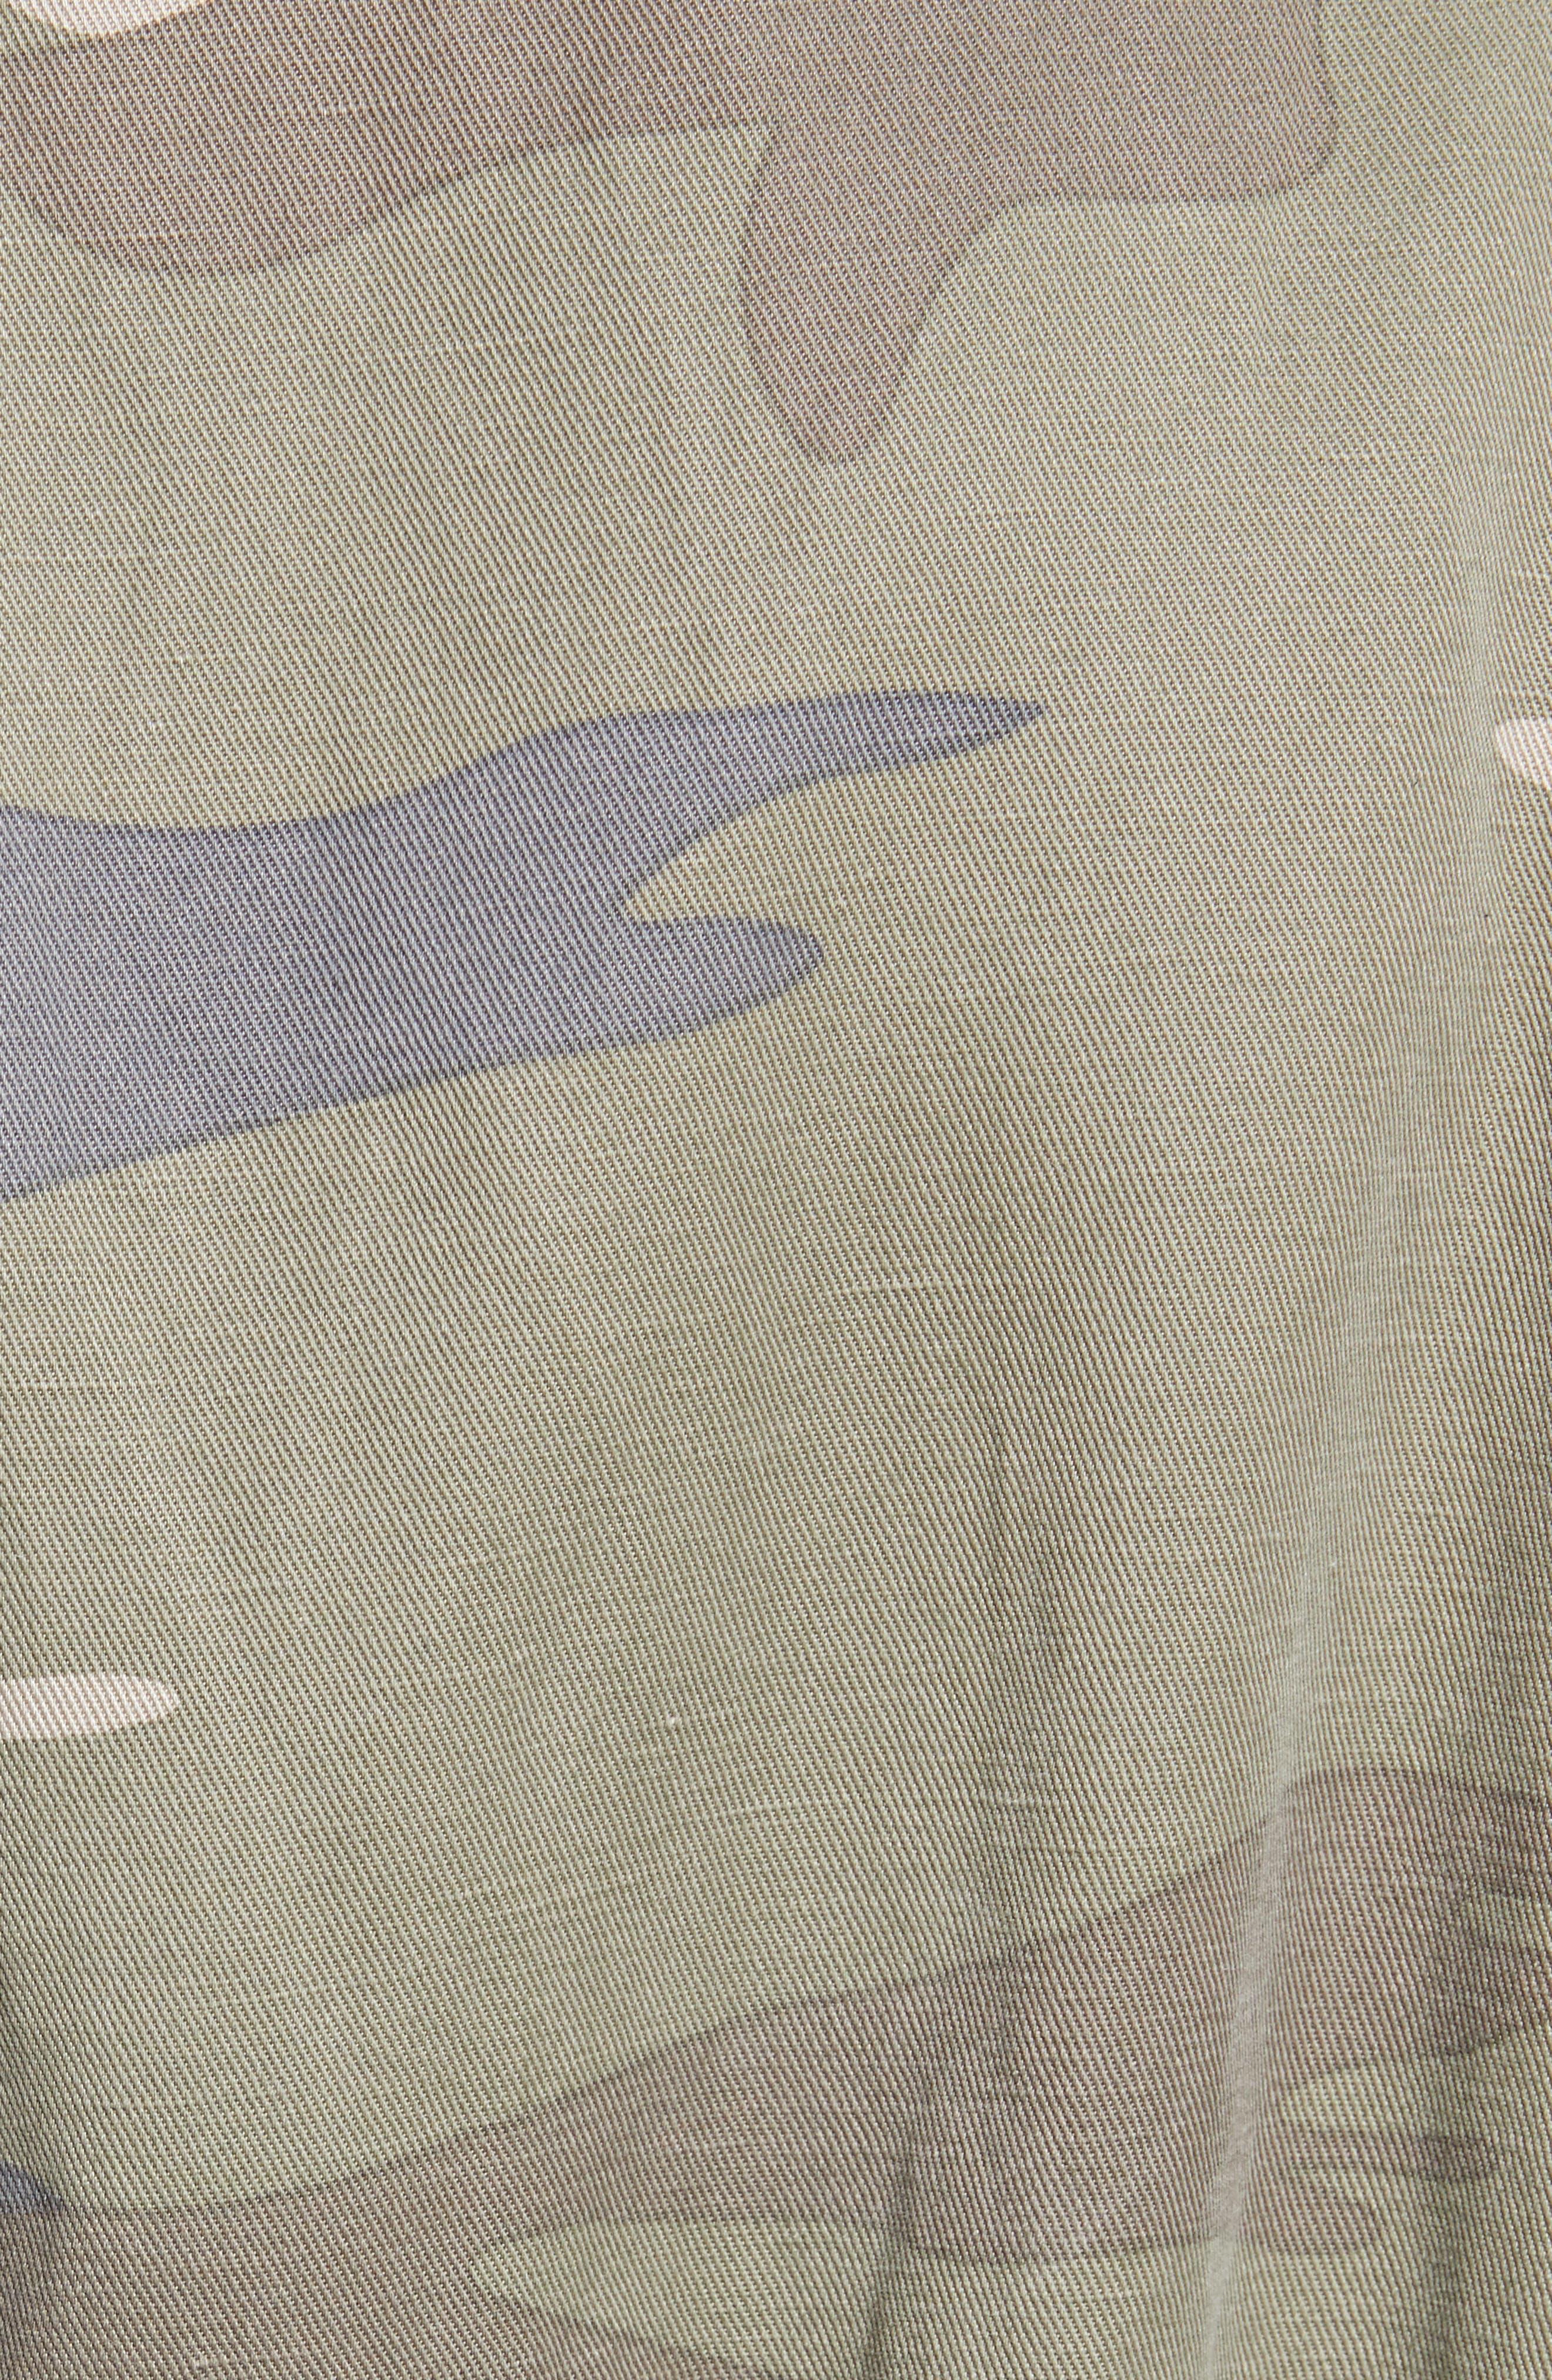 Whitaker Camo Utility Linen Blend Jacket,                             Alternate thumbnail 8, color,                             SAGE CAMO